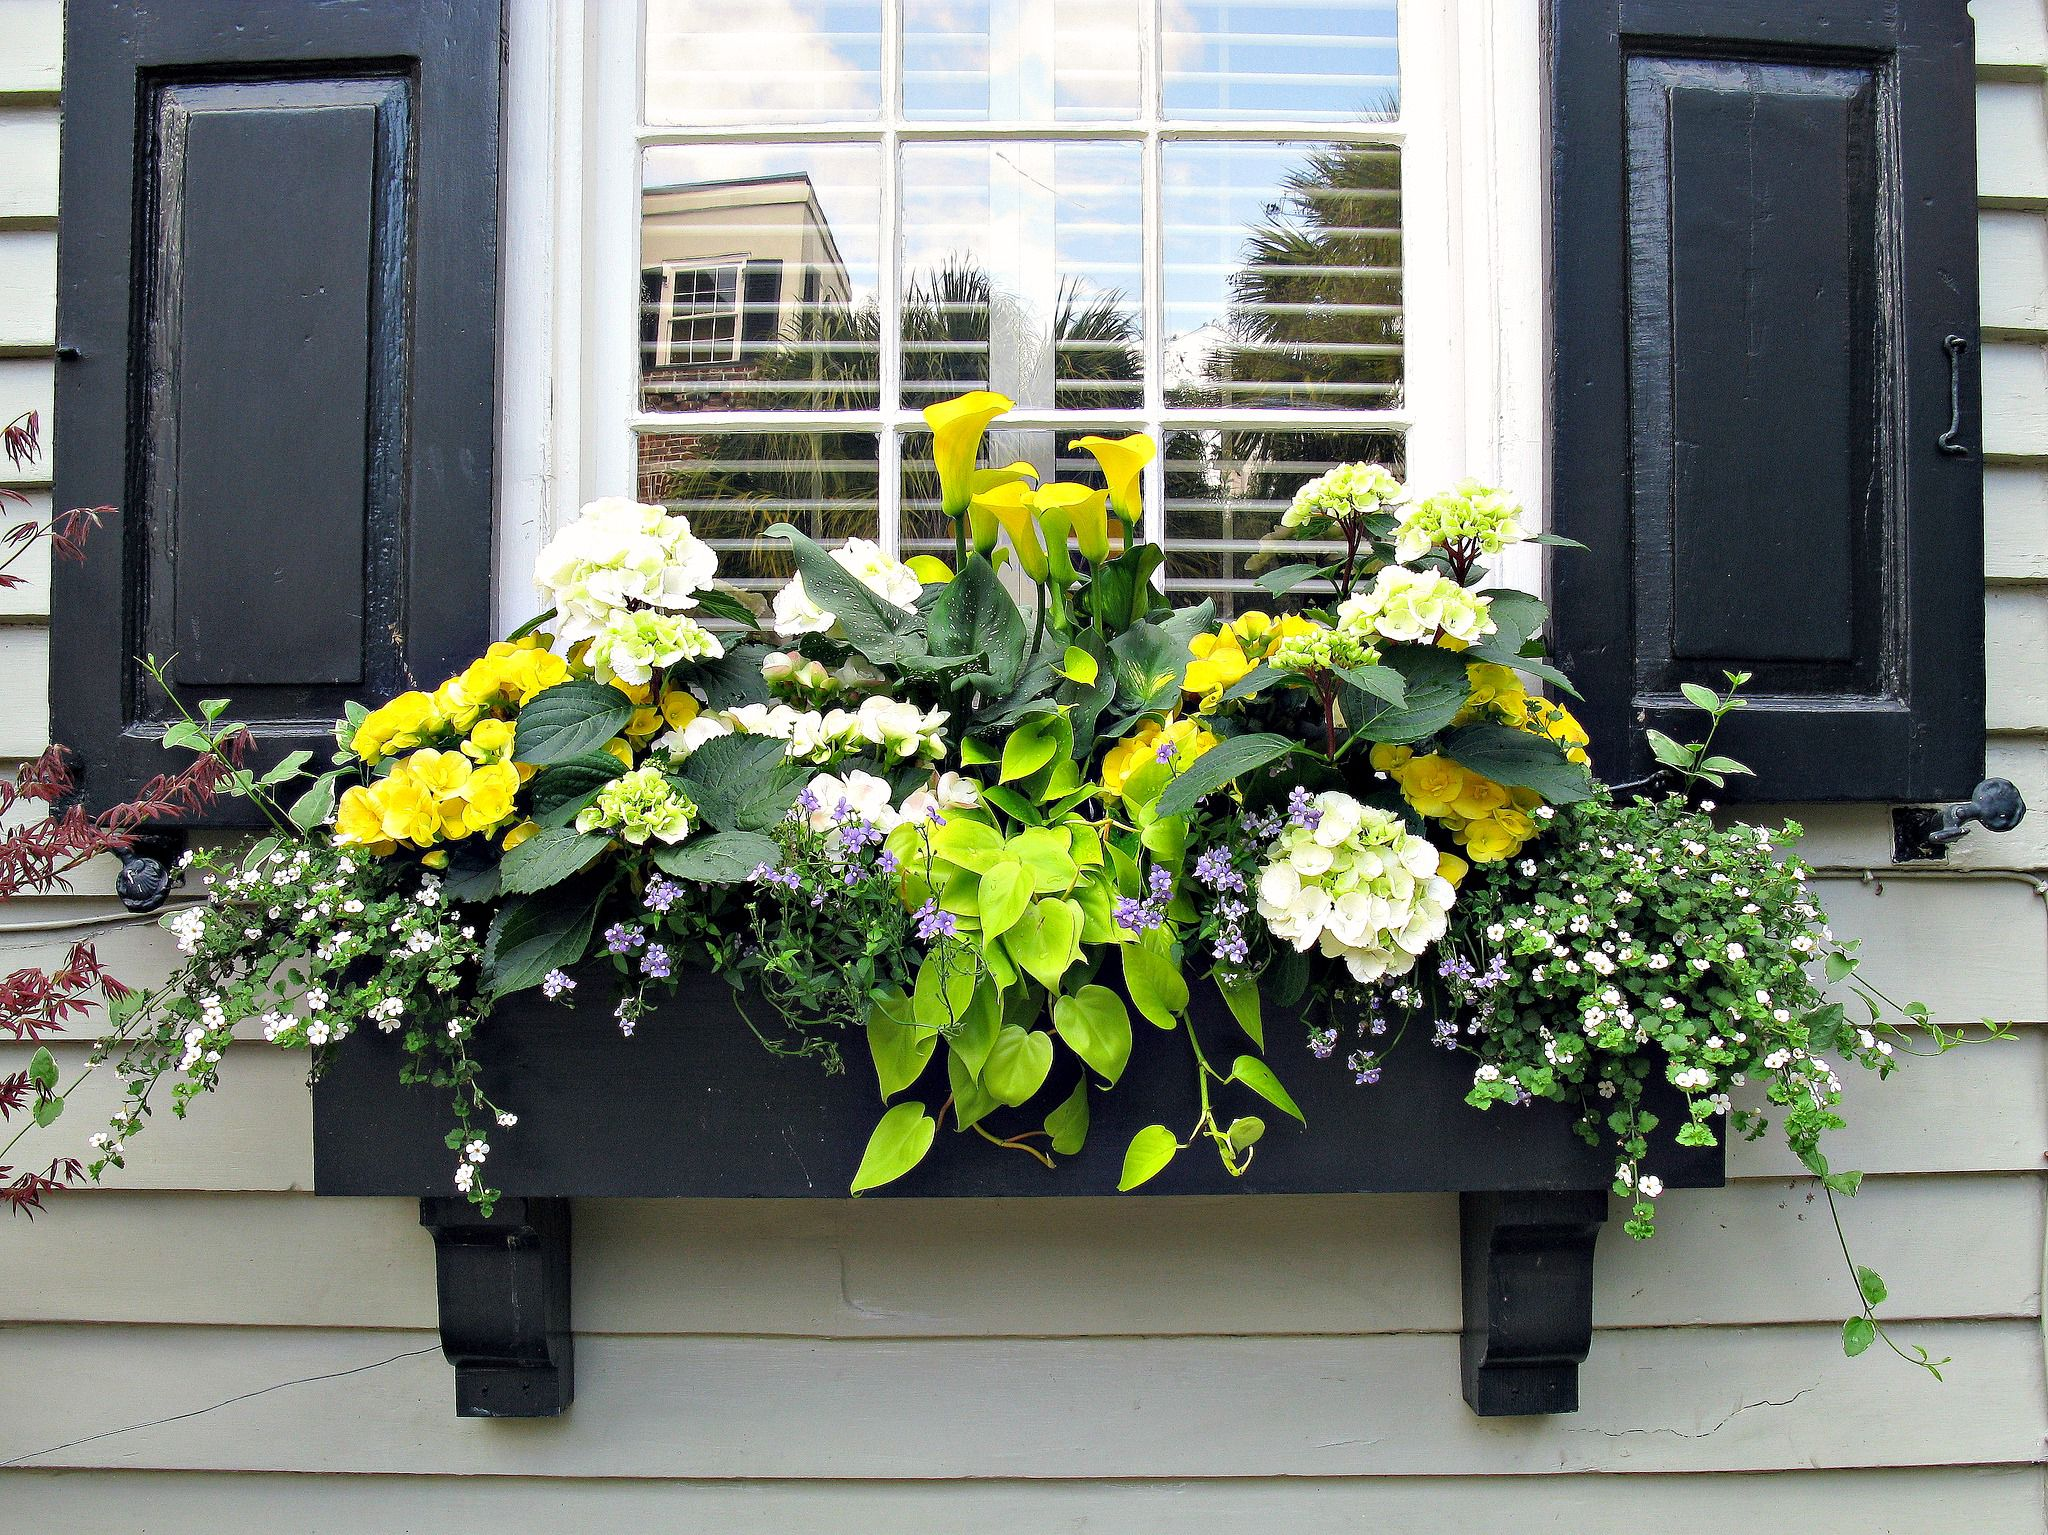 6 Gorgeous Window Box Ideas for Spring